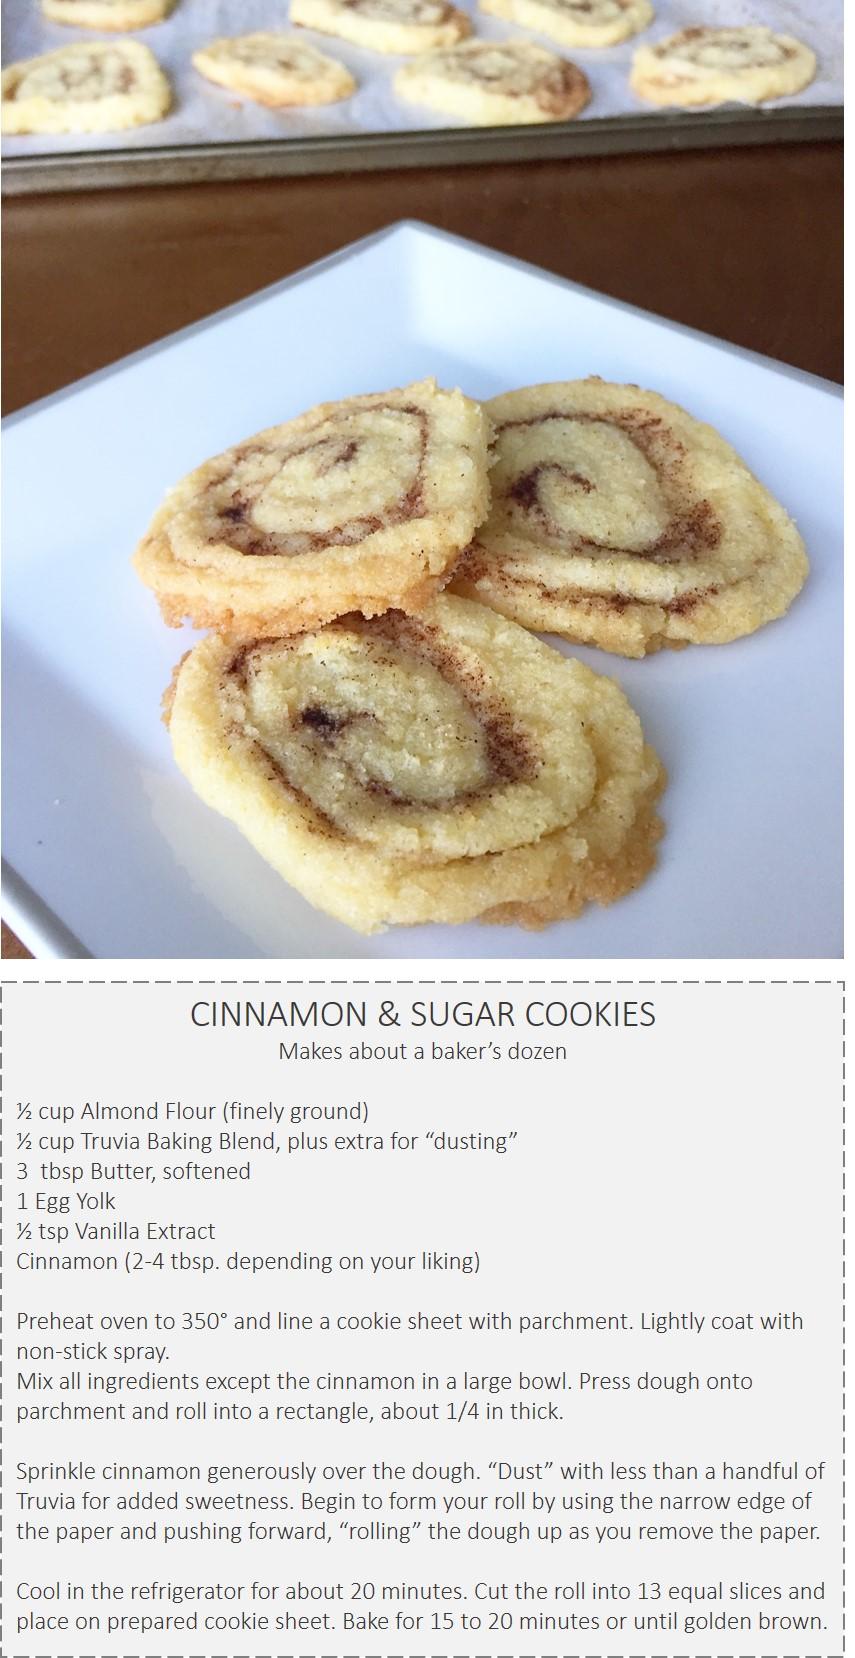 Gluten Free Cinnamon and Sugar Cookies